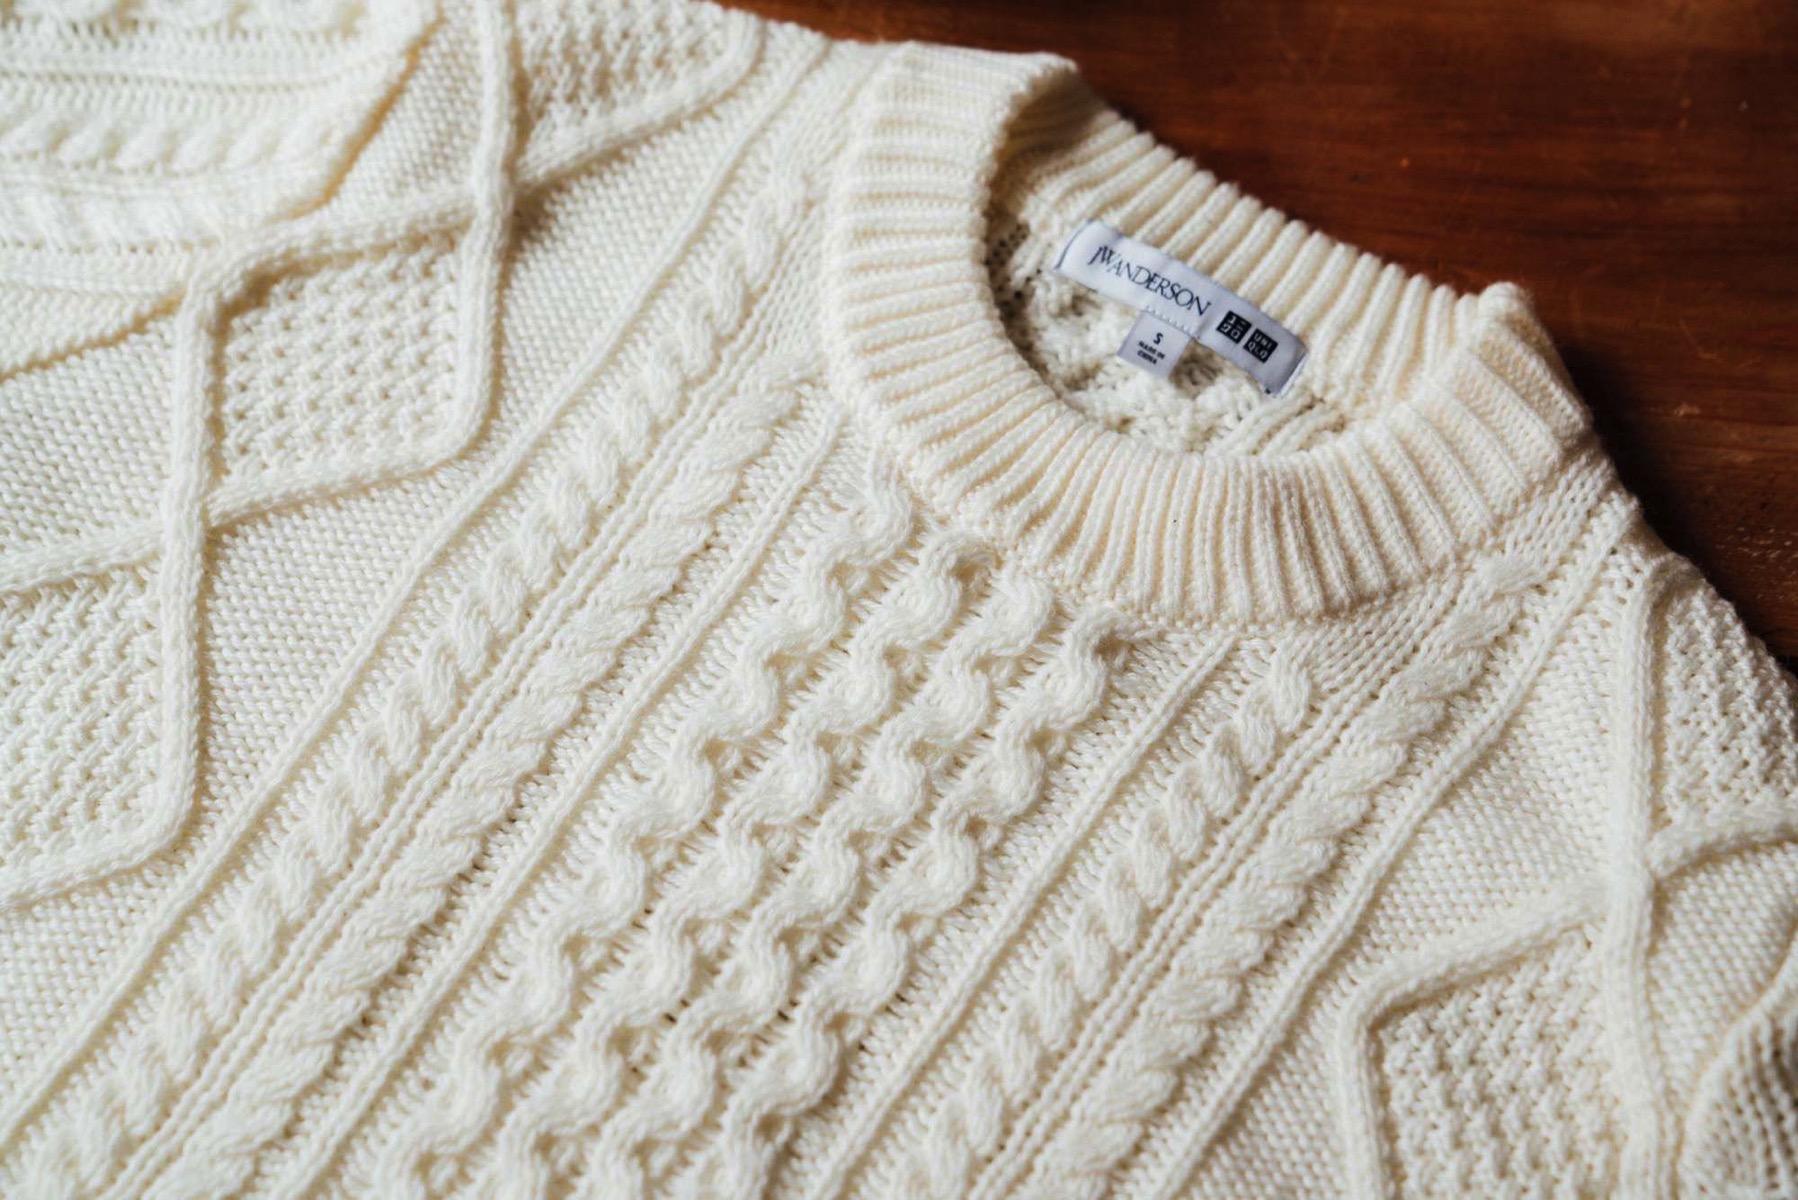 Uniqlo jw anderson wool 1